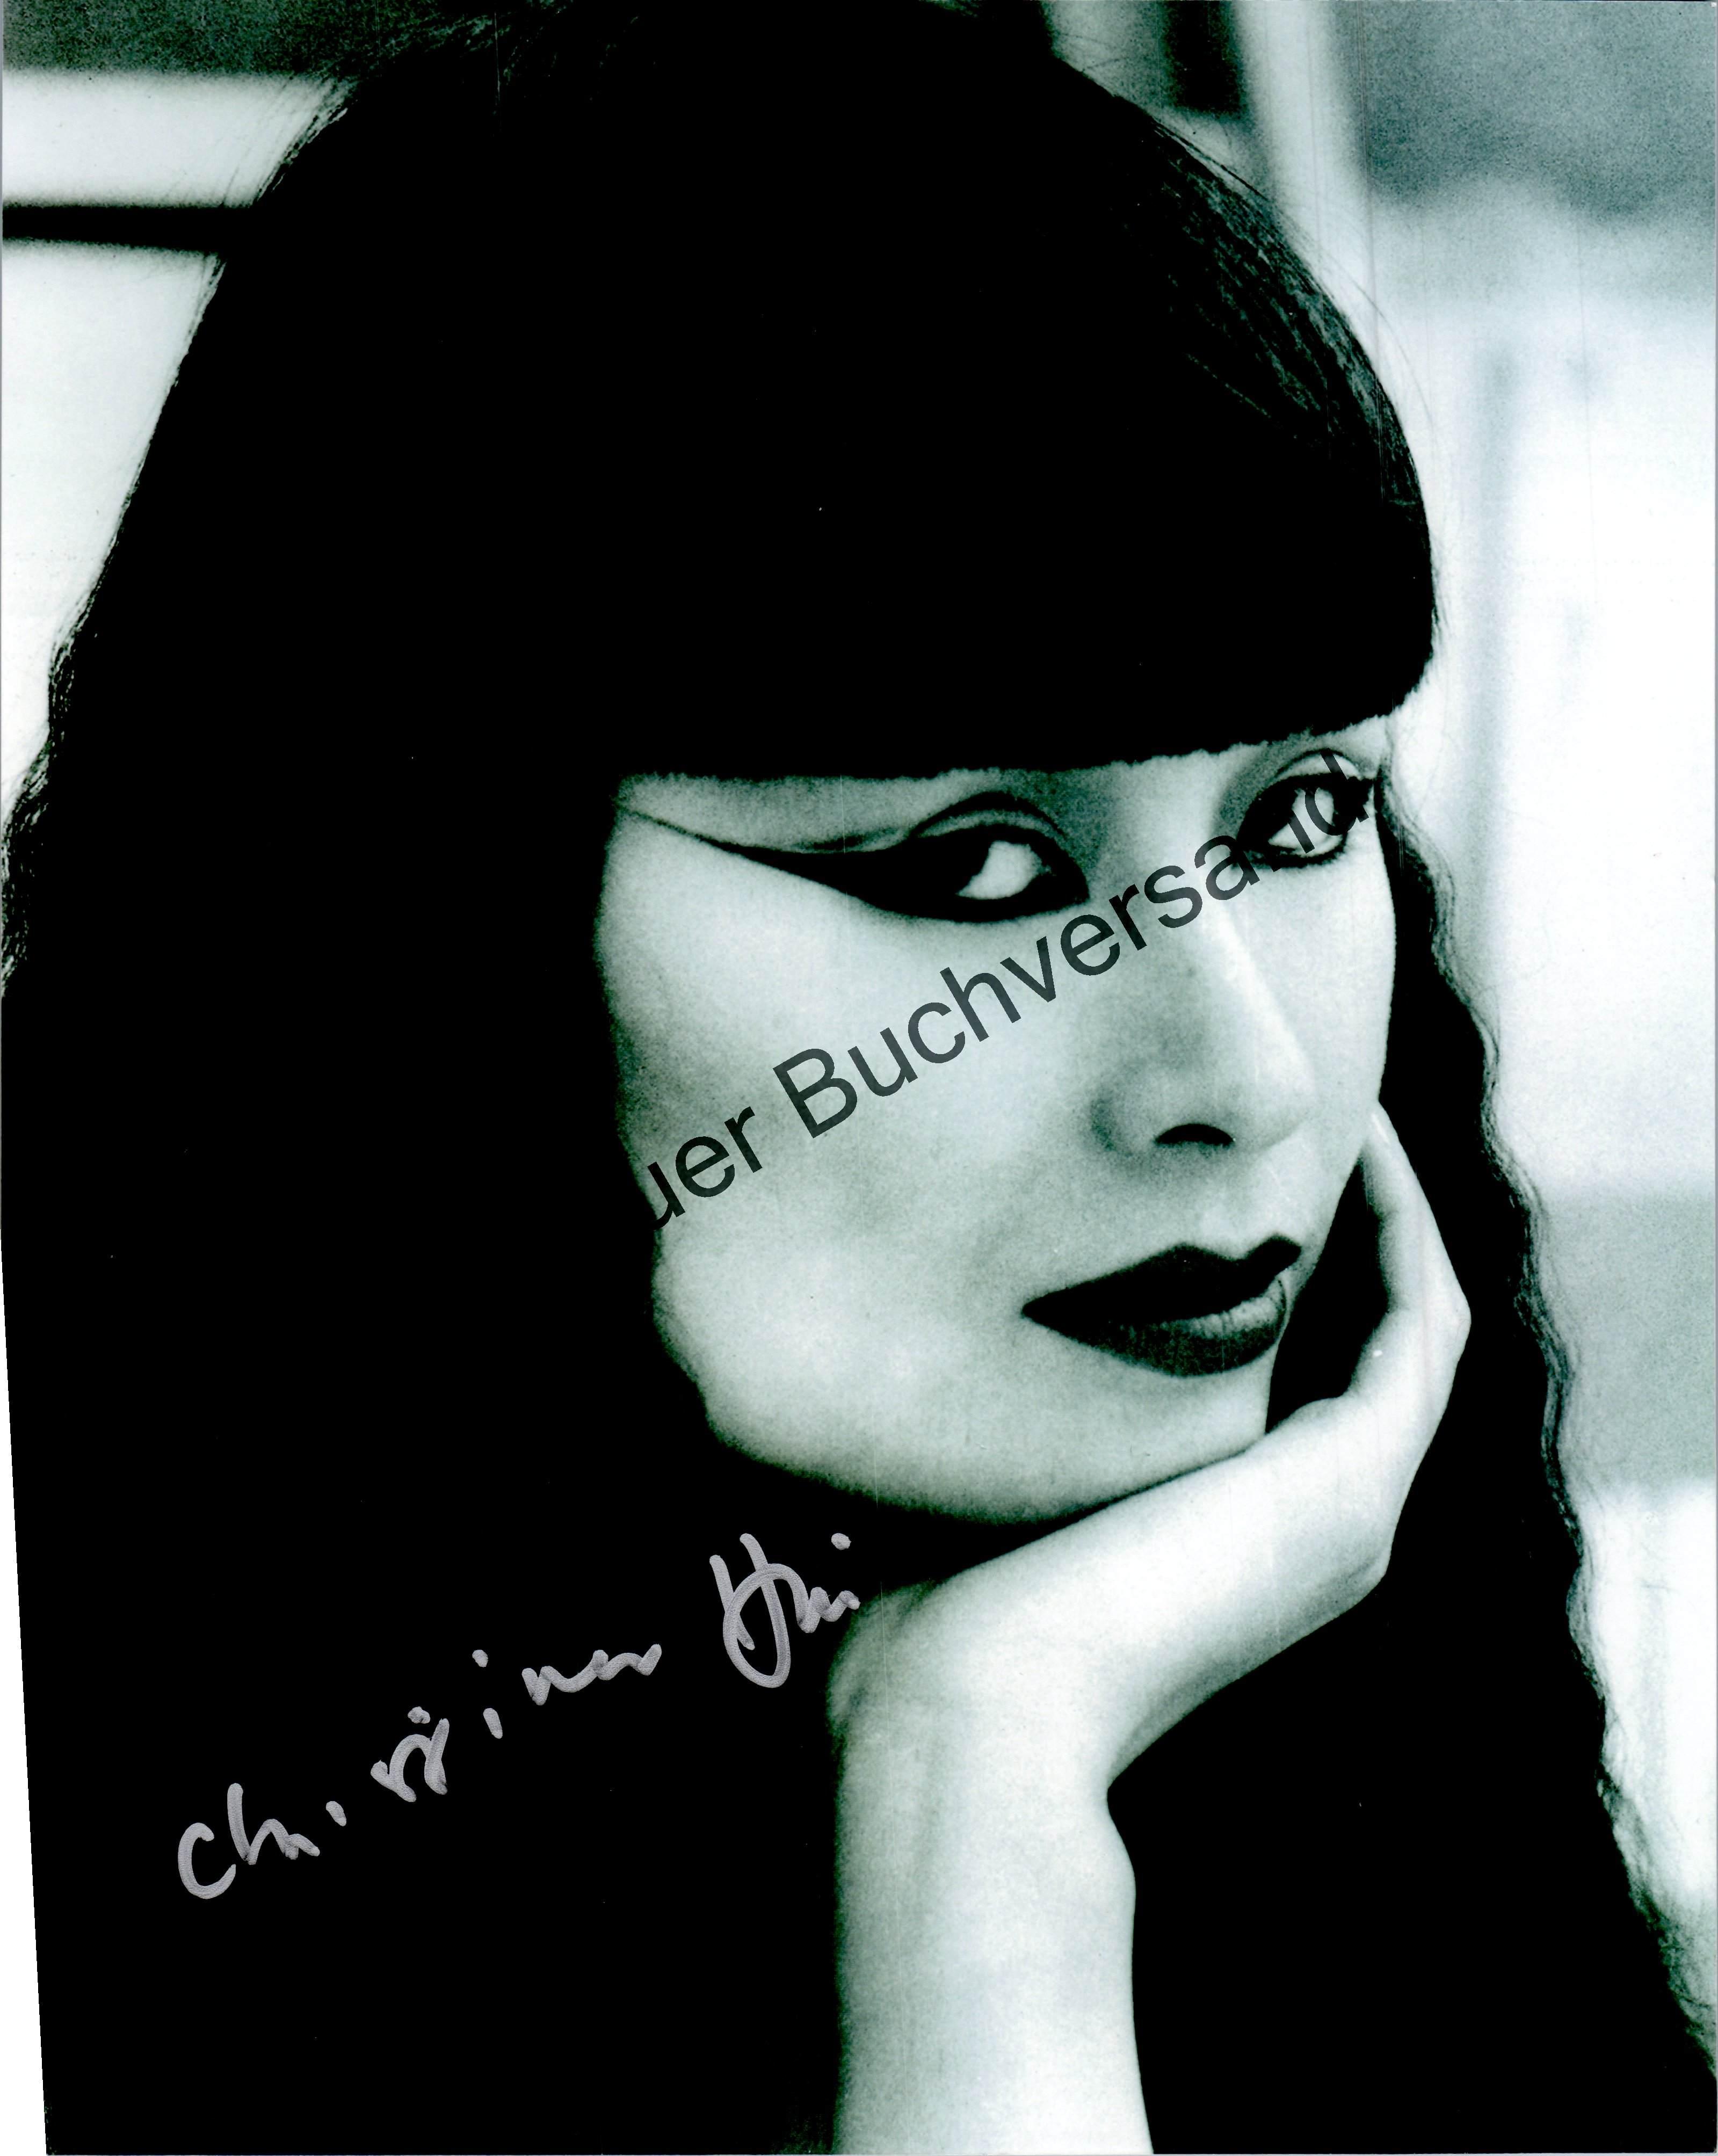 Original Autograph Christina Hui James Bond COA /// Autogramm Autograph signiert signed signee